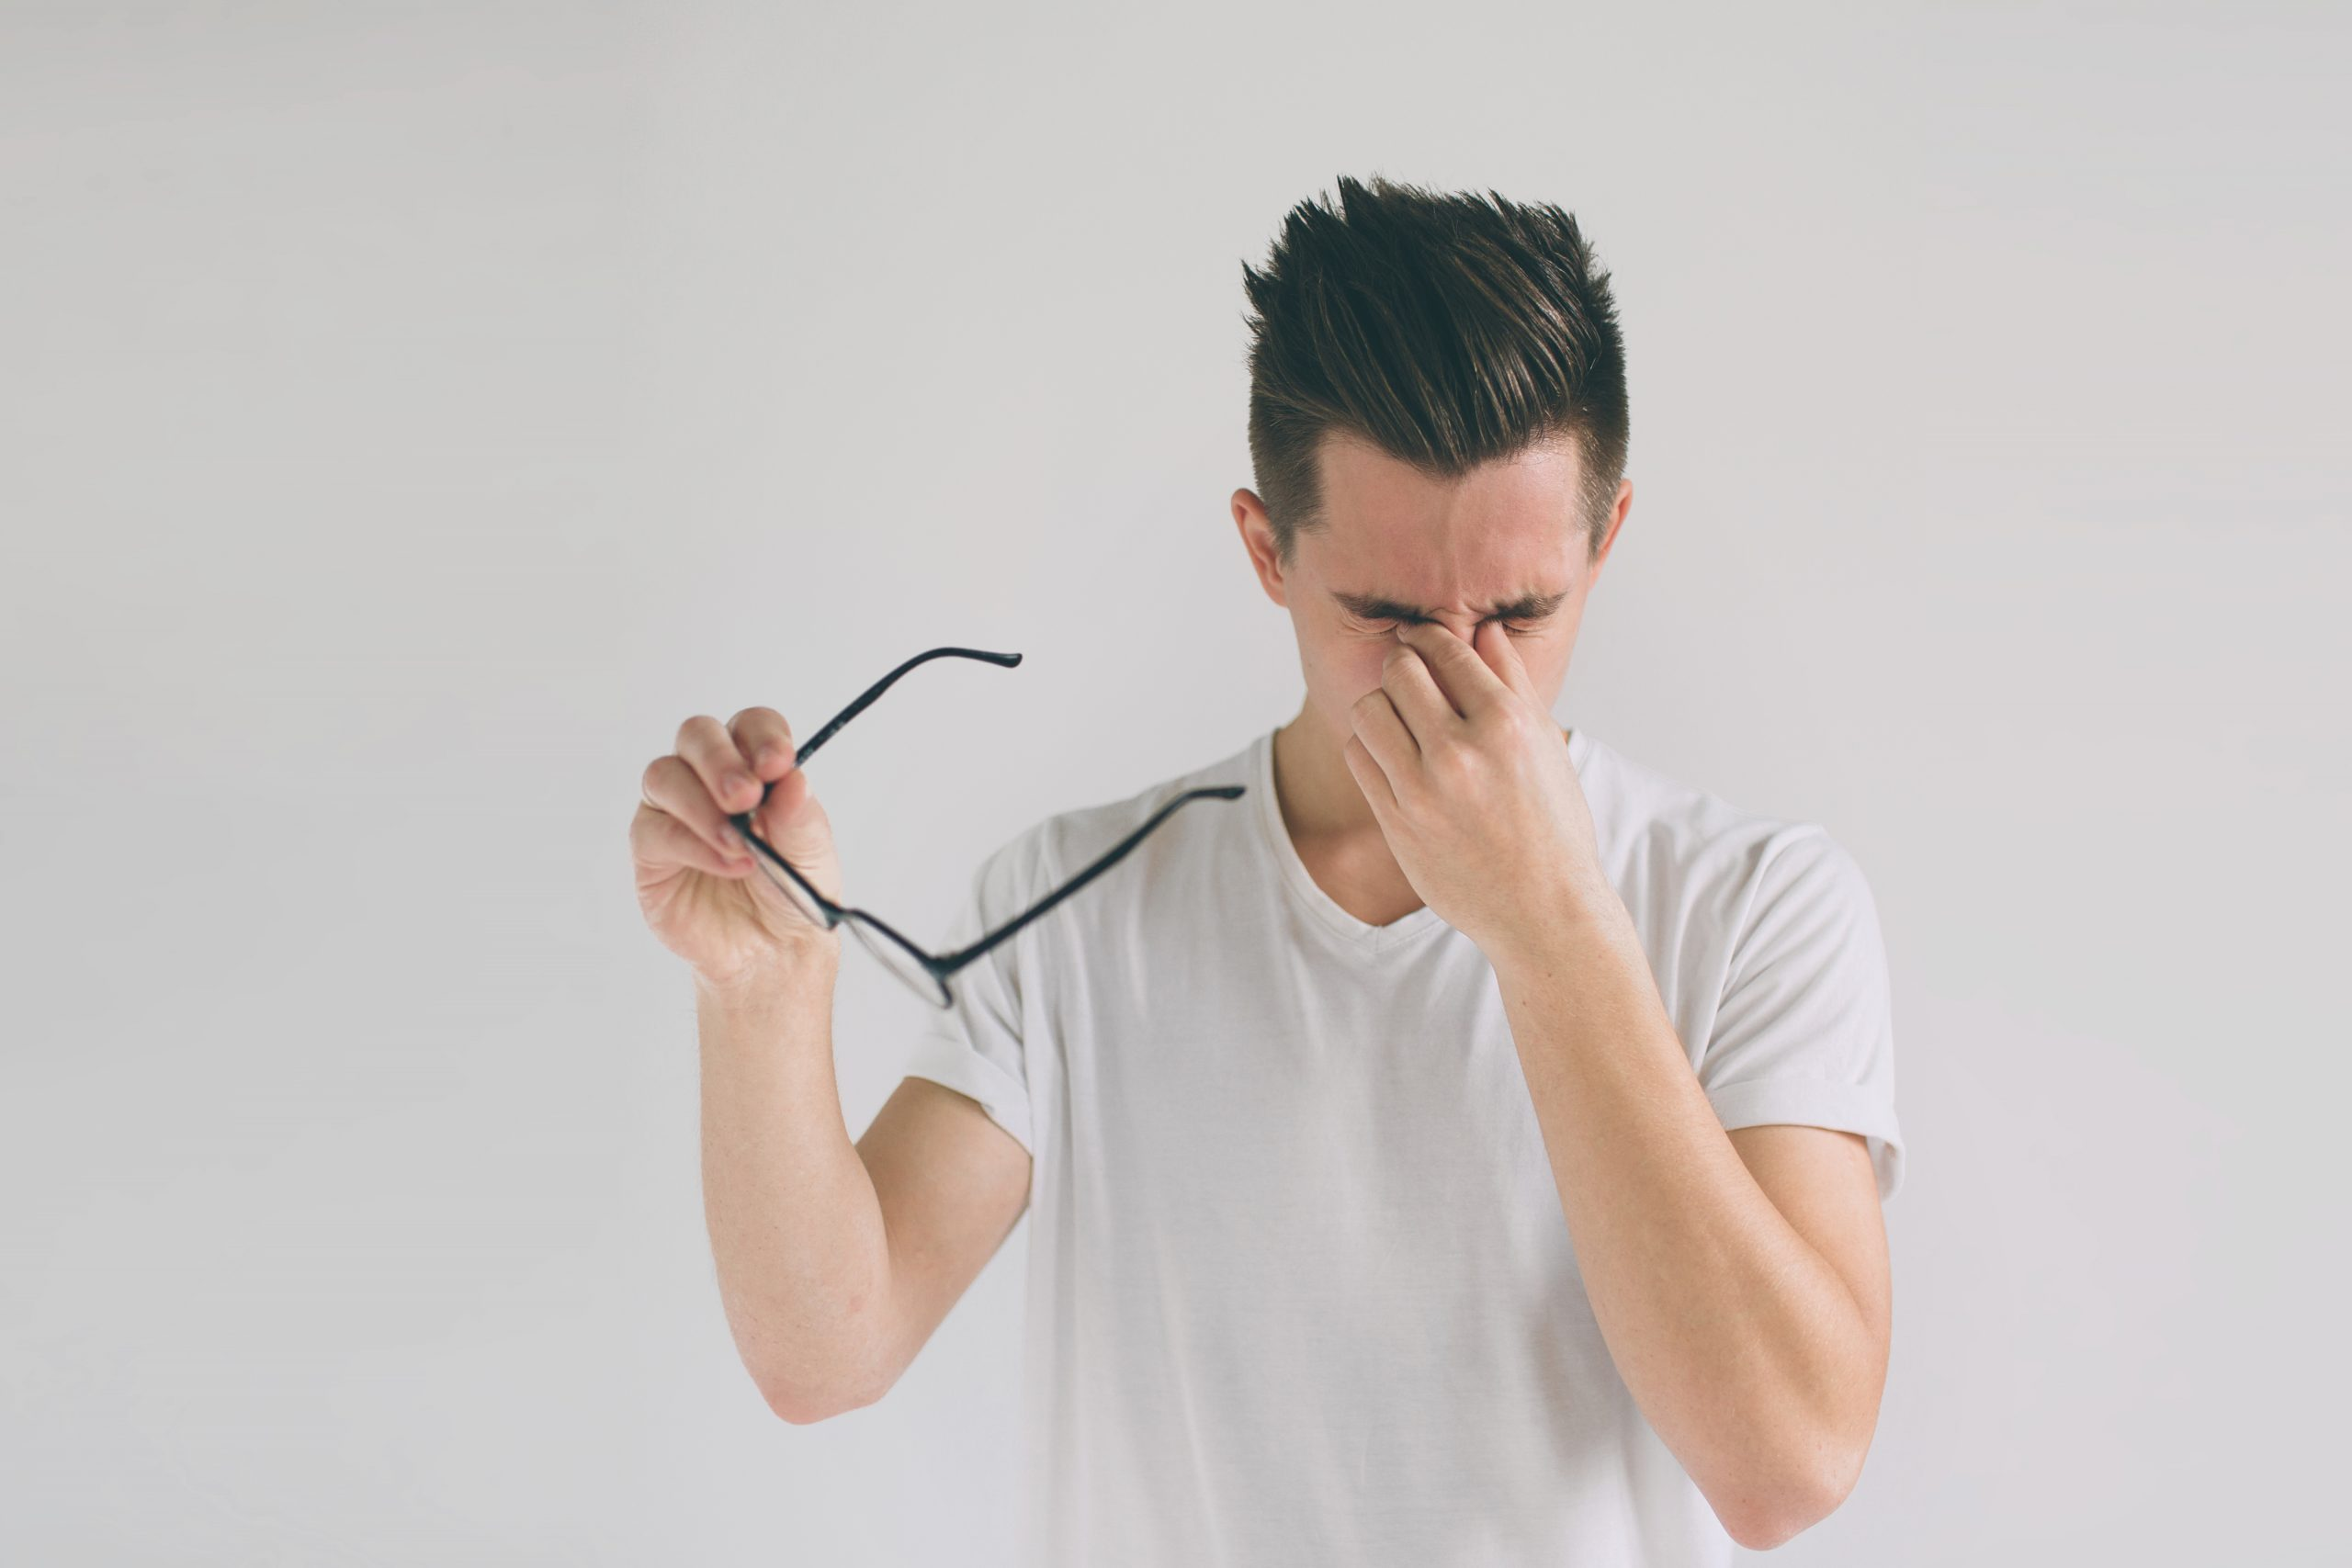 7 Bad Habits that Affect Eyesight